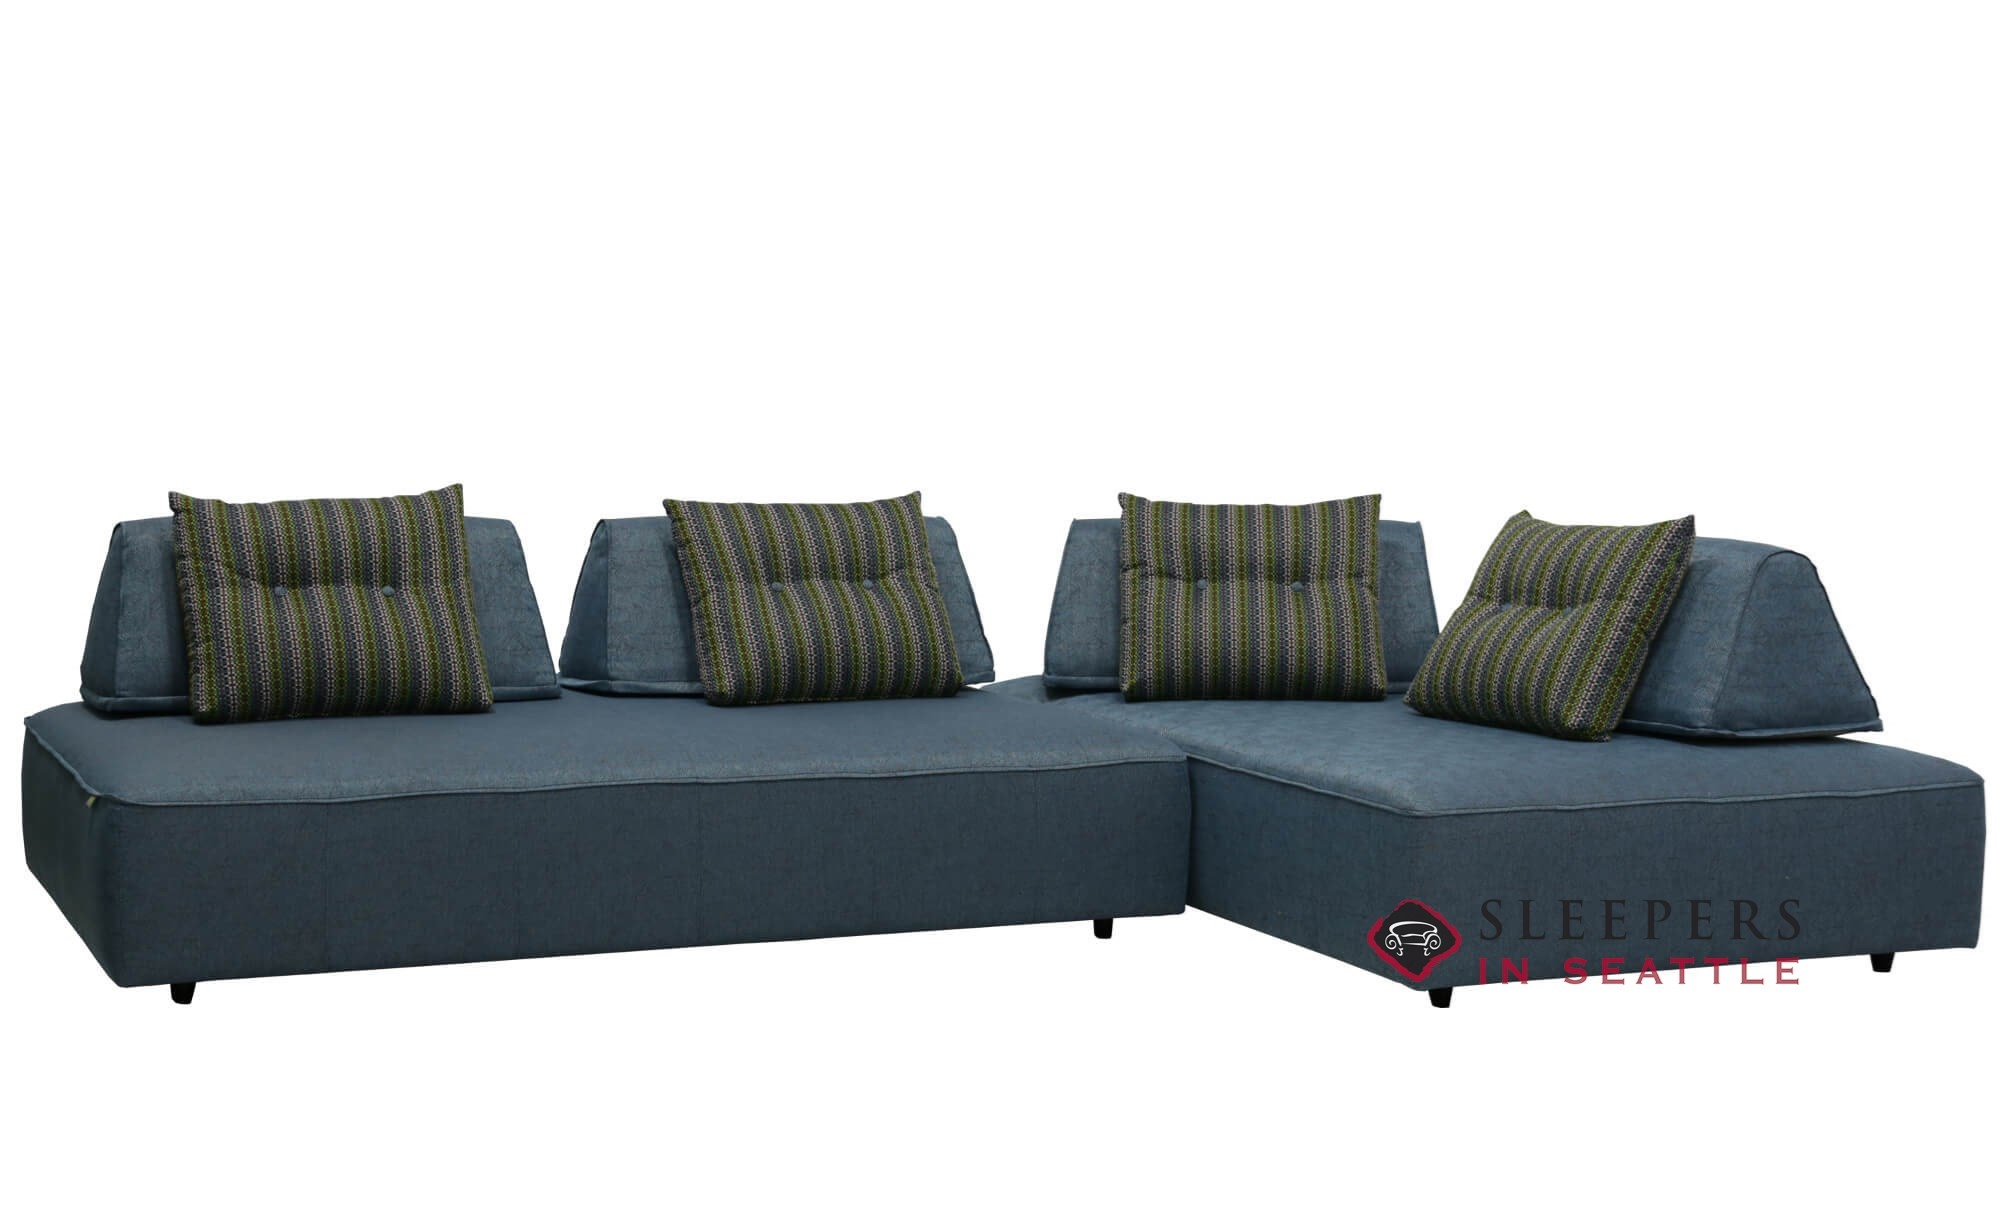 Luonto Street Sectional Sleeper Sofa